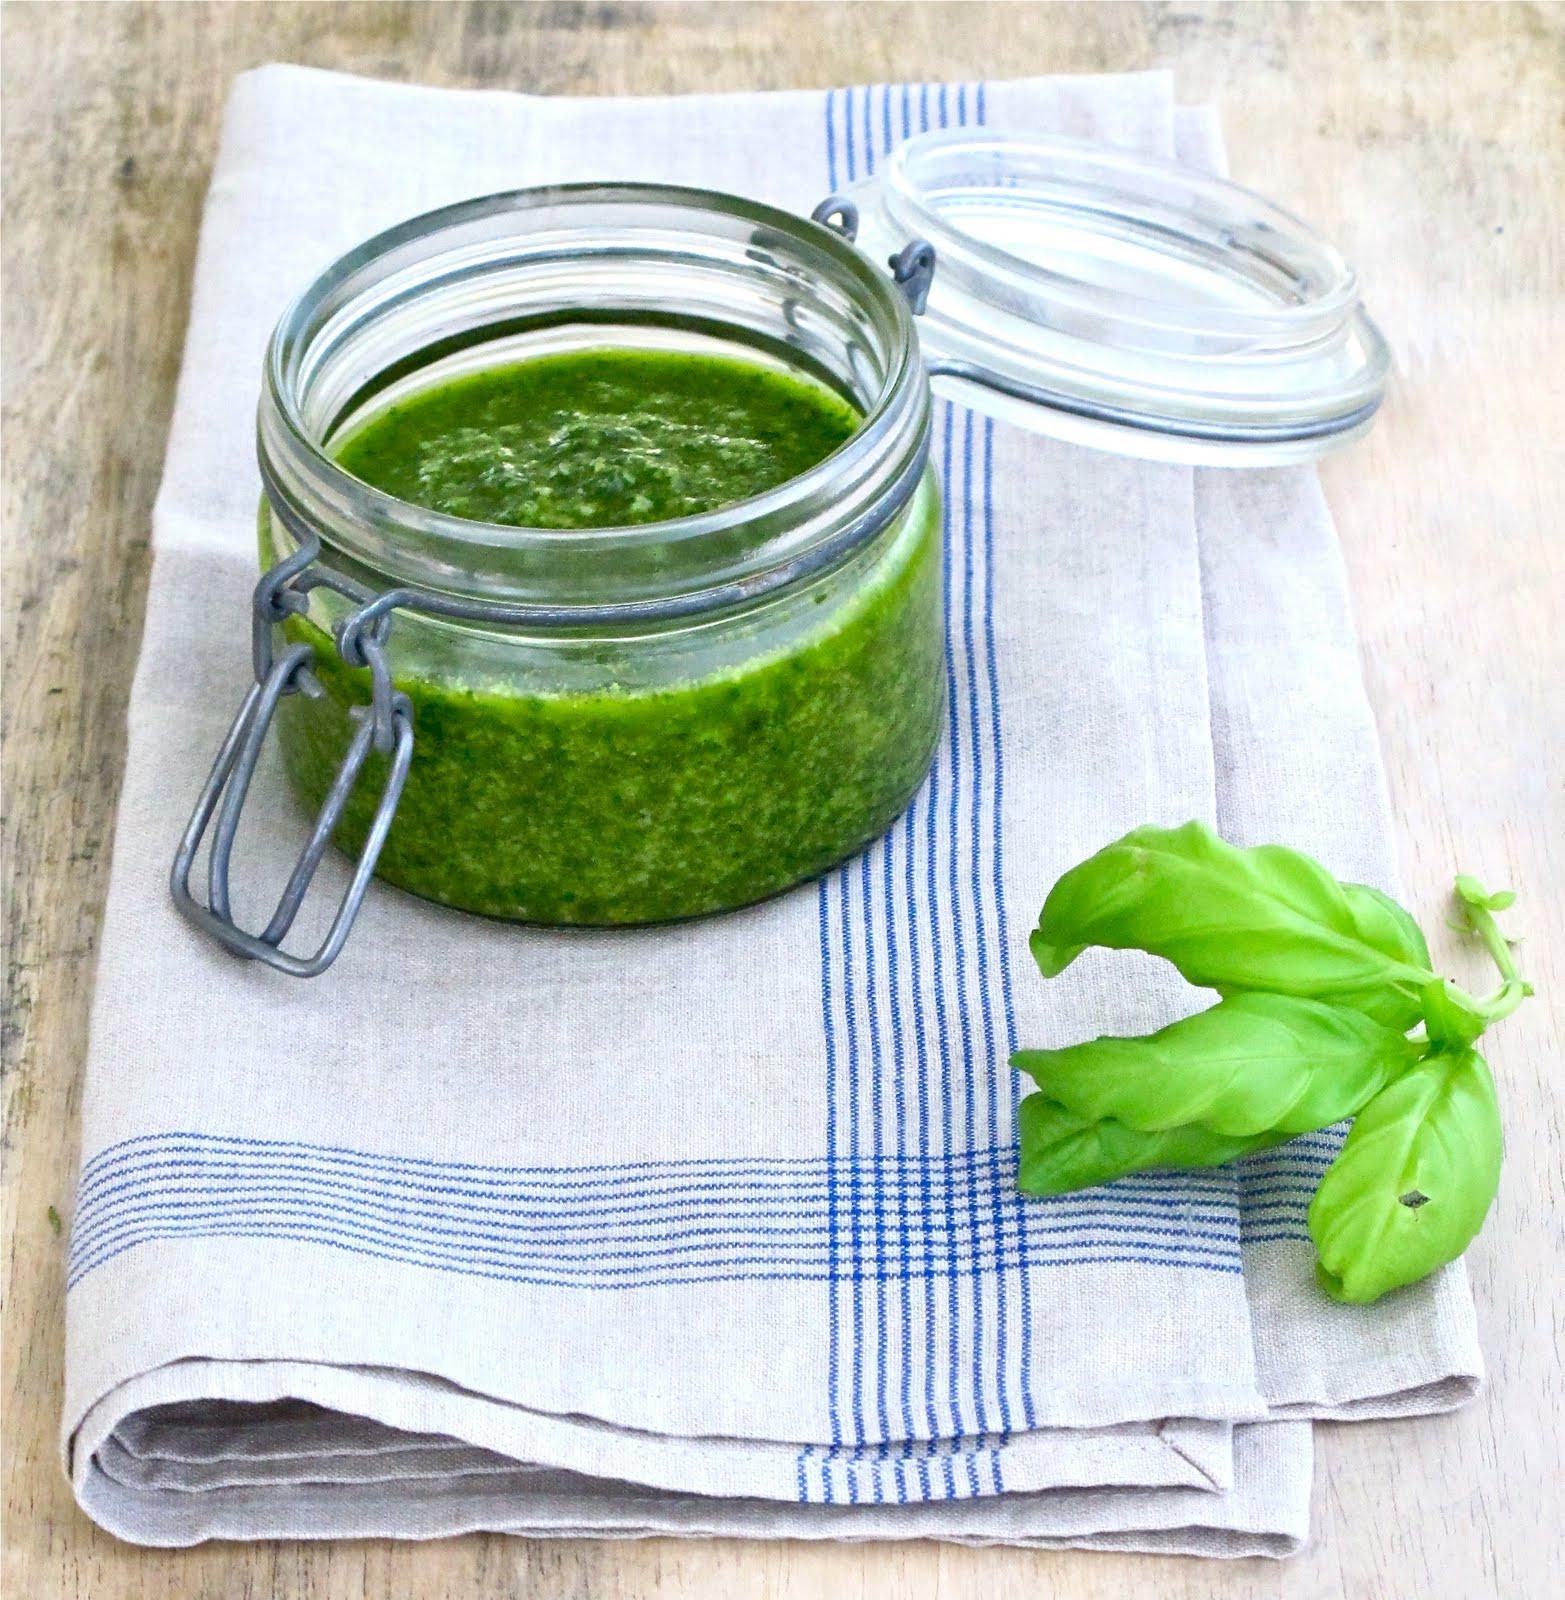 Pesto Sauce Recipe  Jenny Steffens Hobick Homemade Pesto Sauce